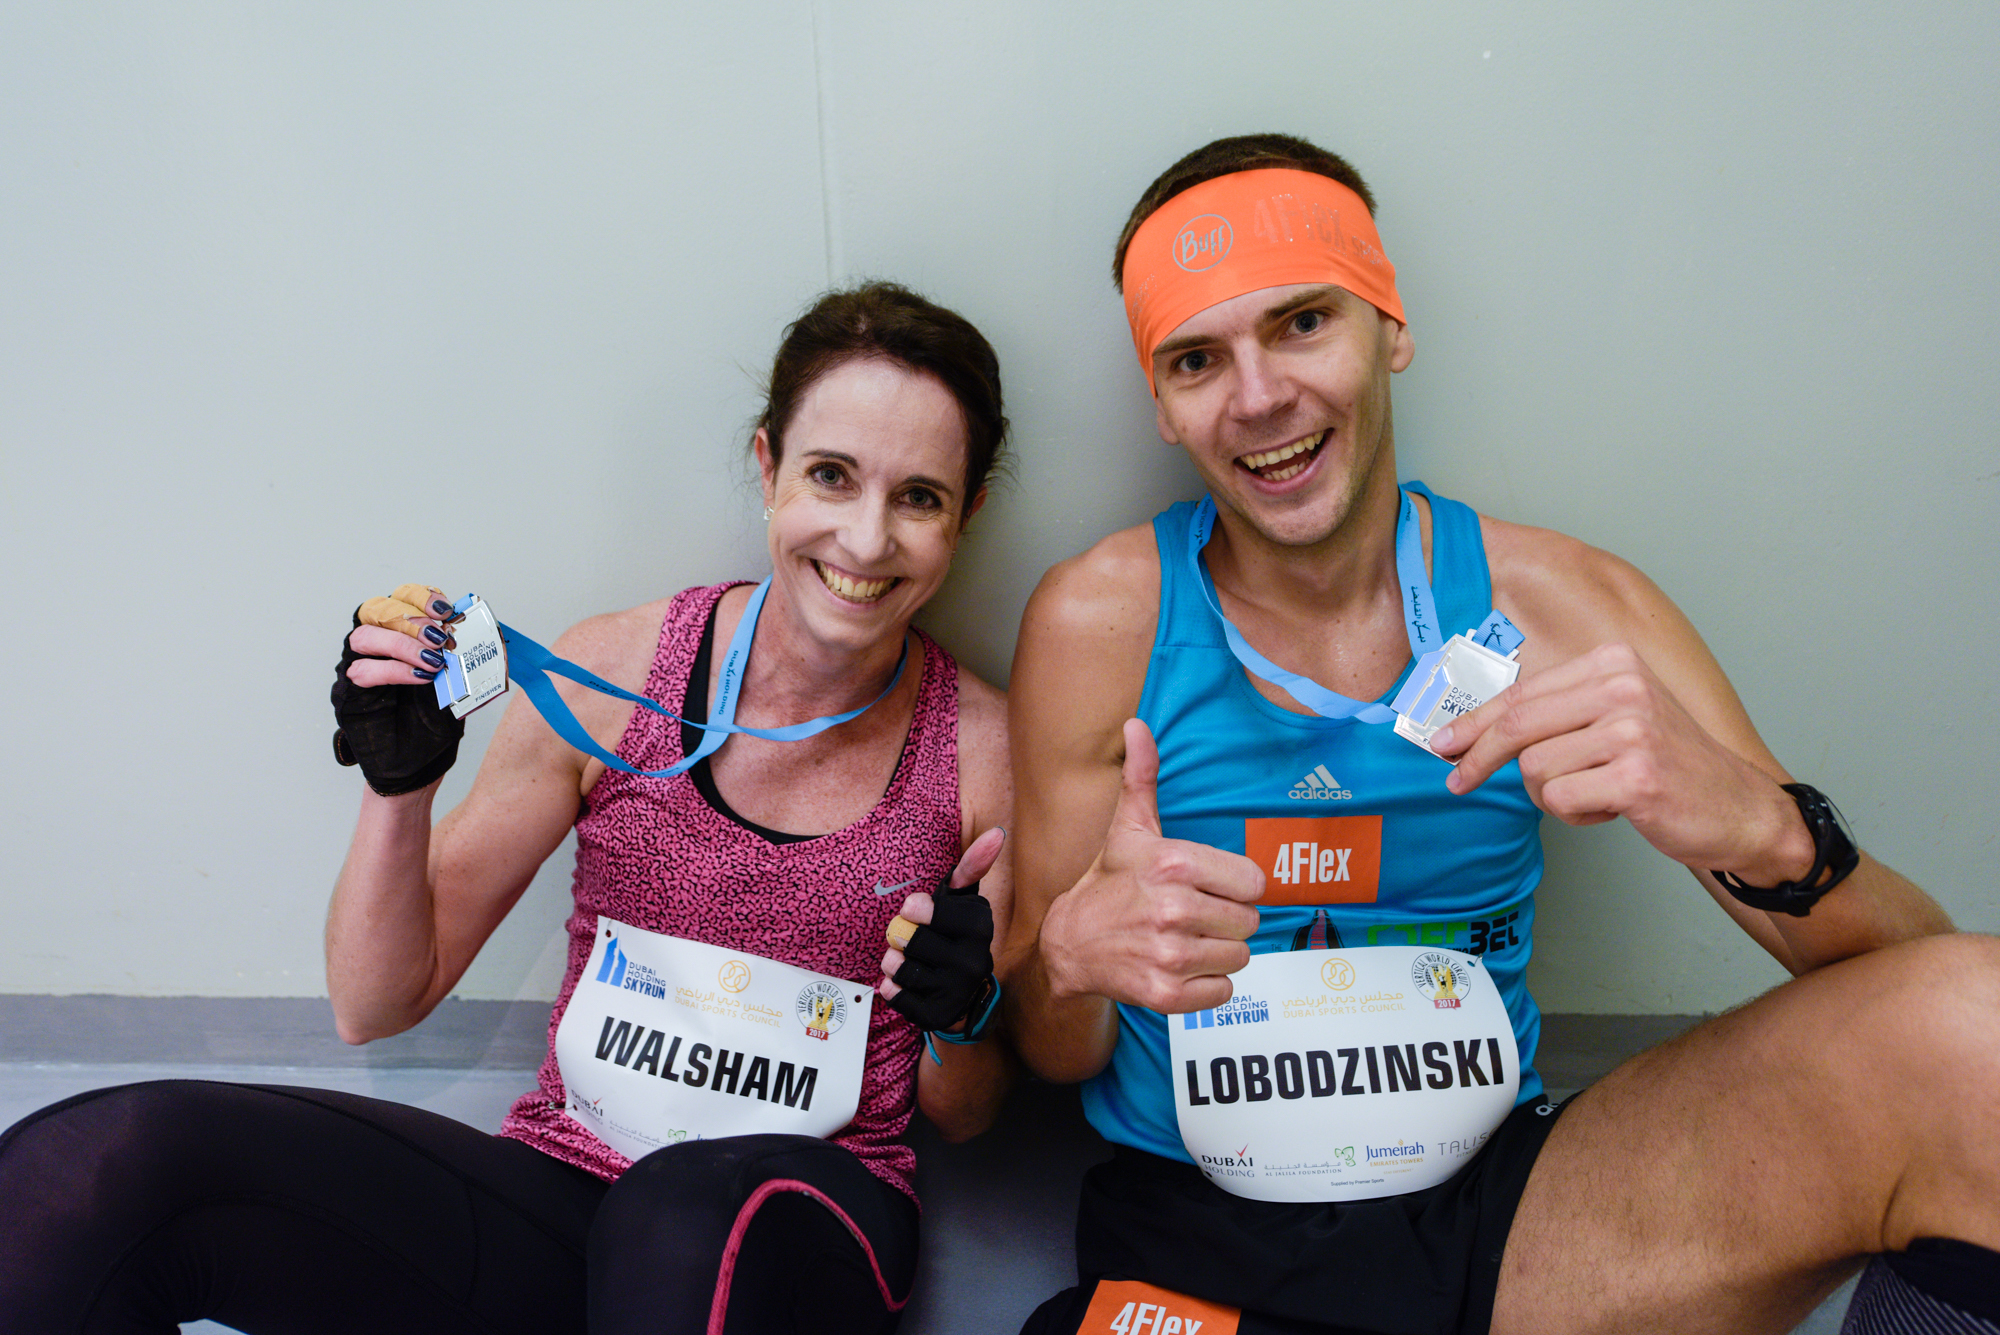 Winners Walsham and Lobodzinski. ©Dubai Holding SkyRun